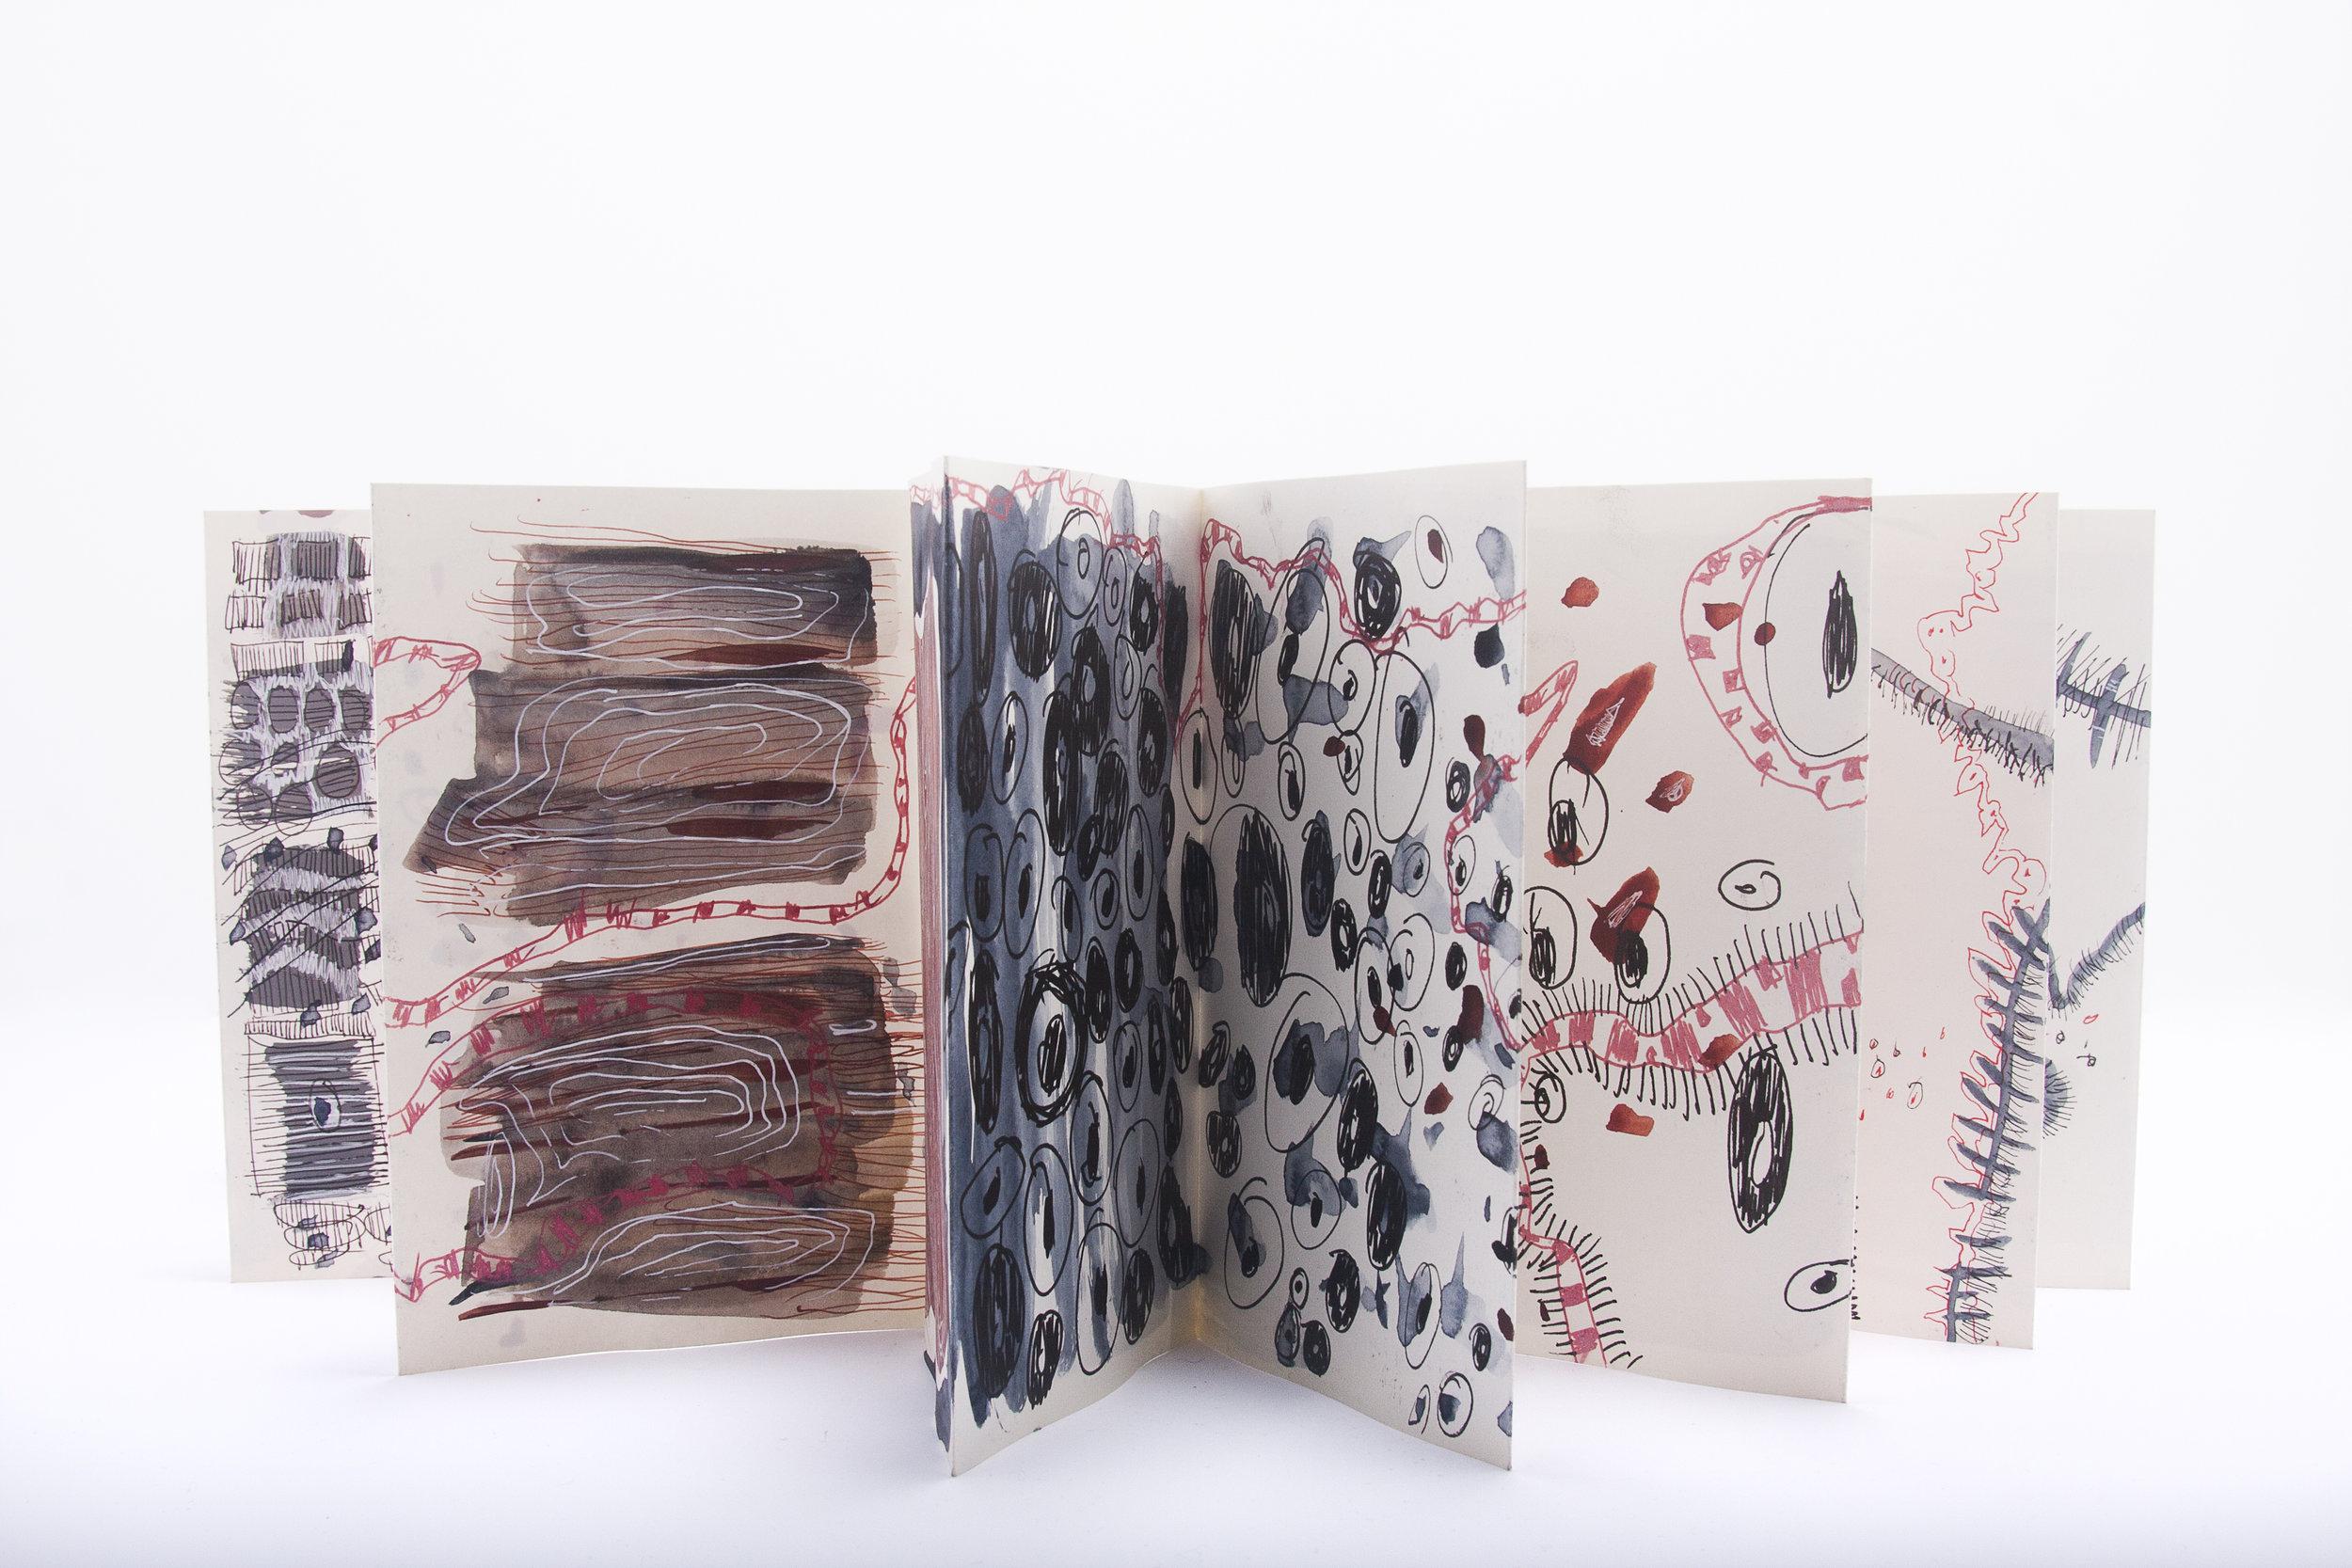 moss-sketchbook-small-11.jpg